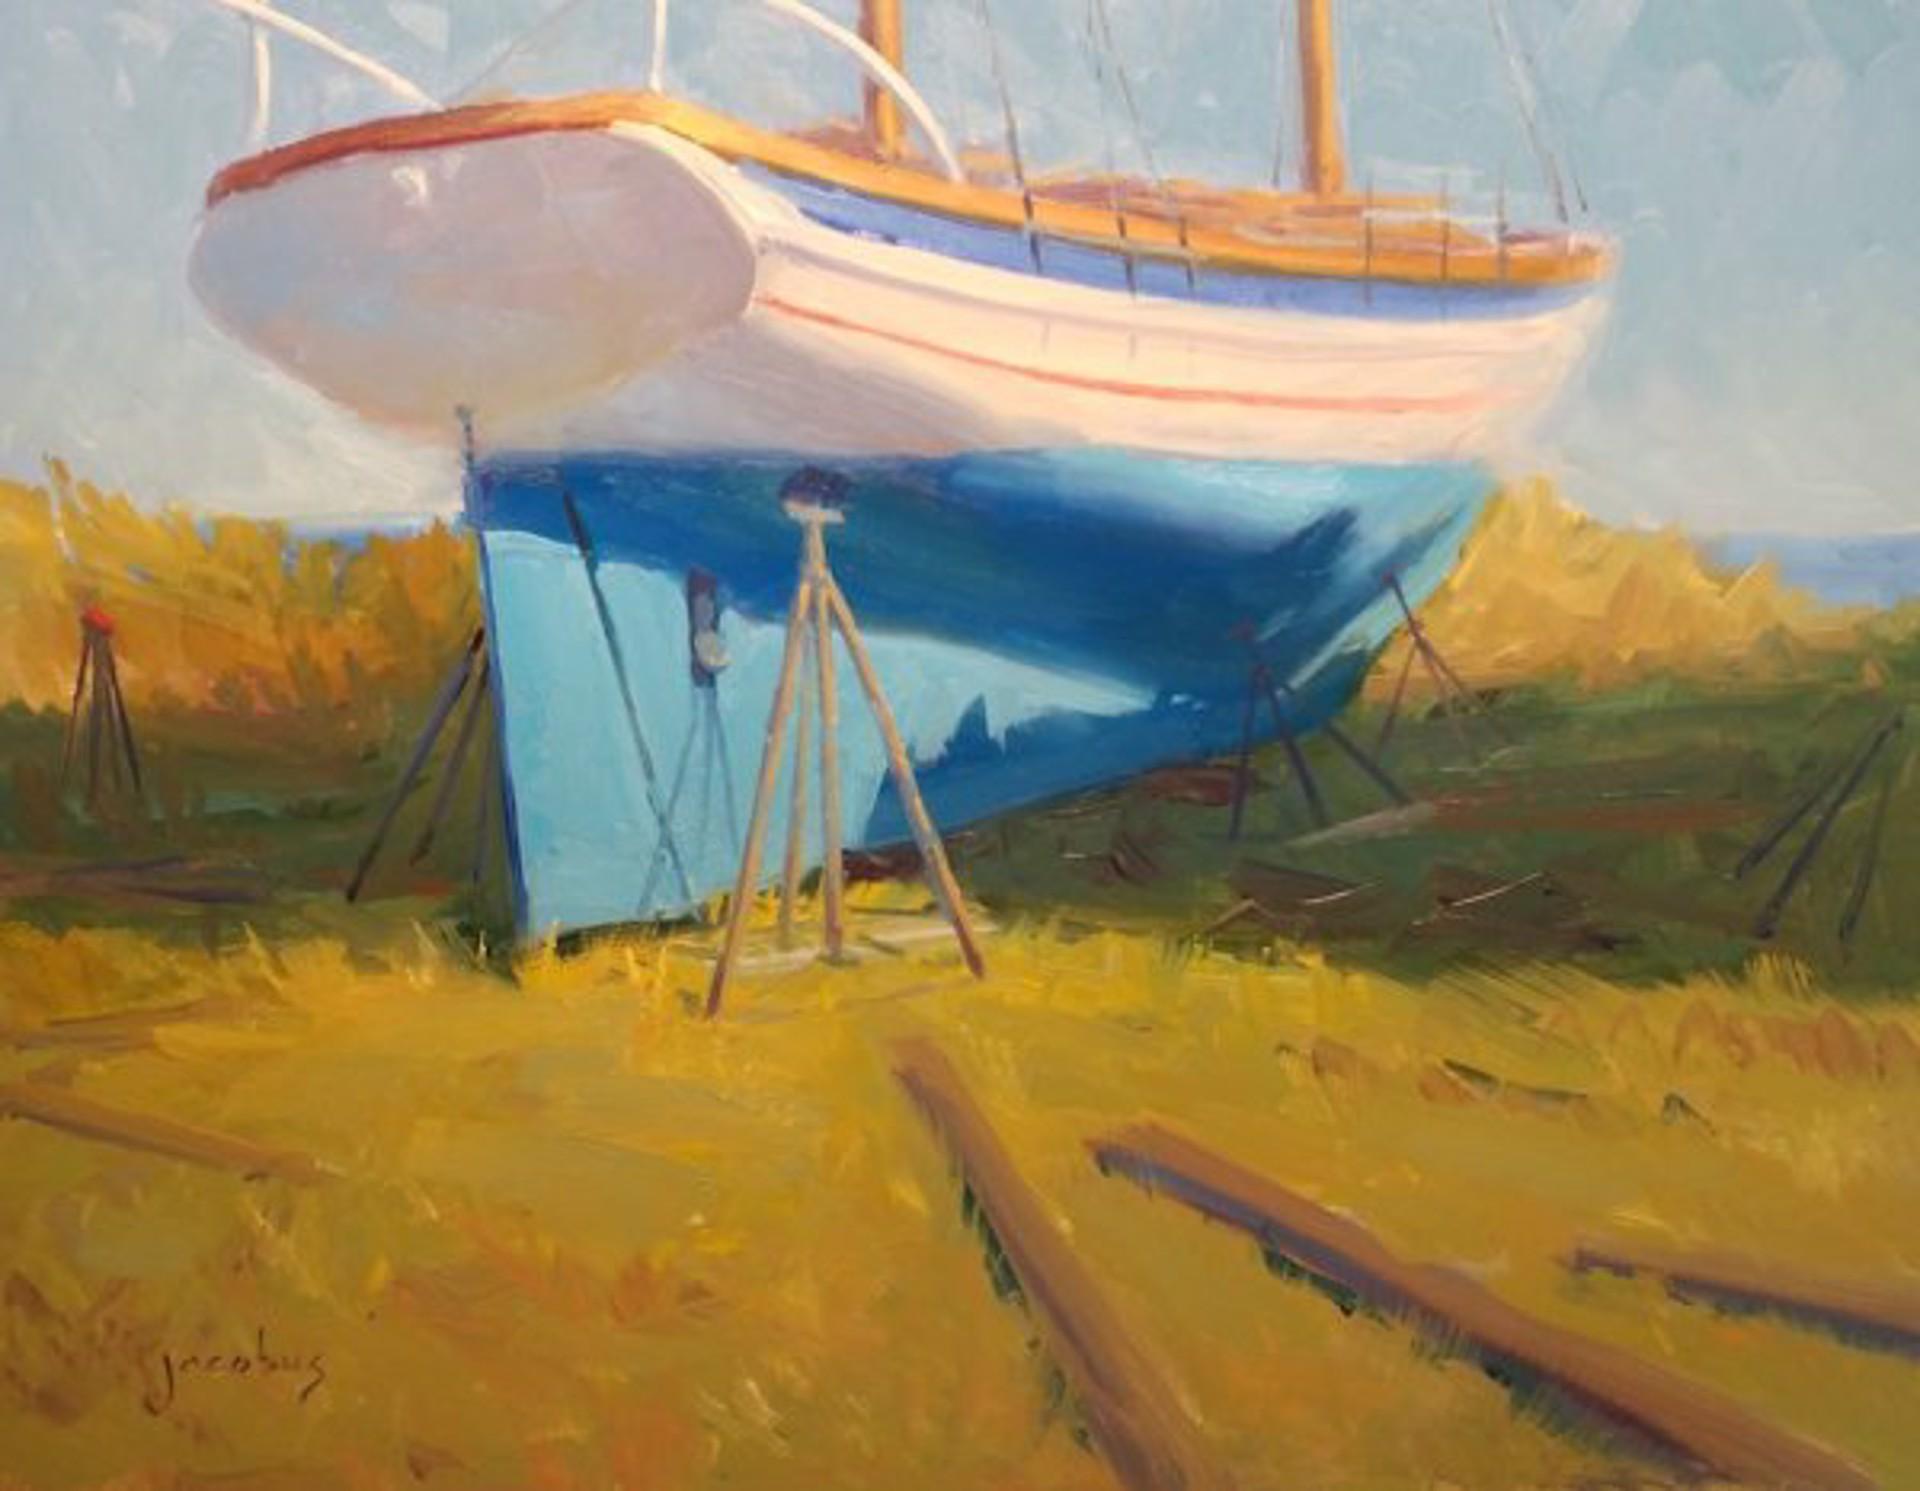 Blue Hull by Jacobus Baas